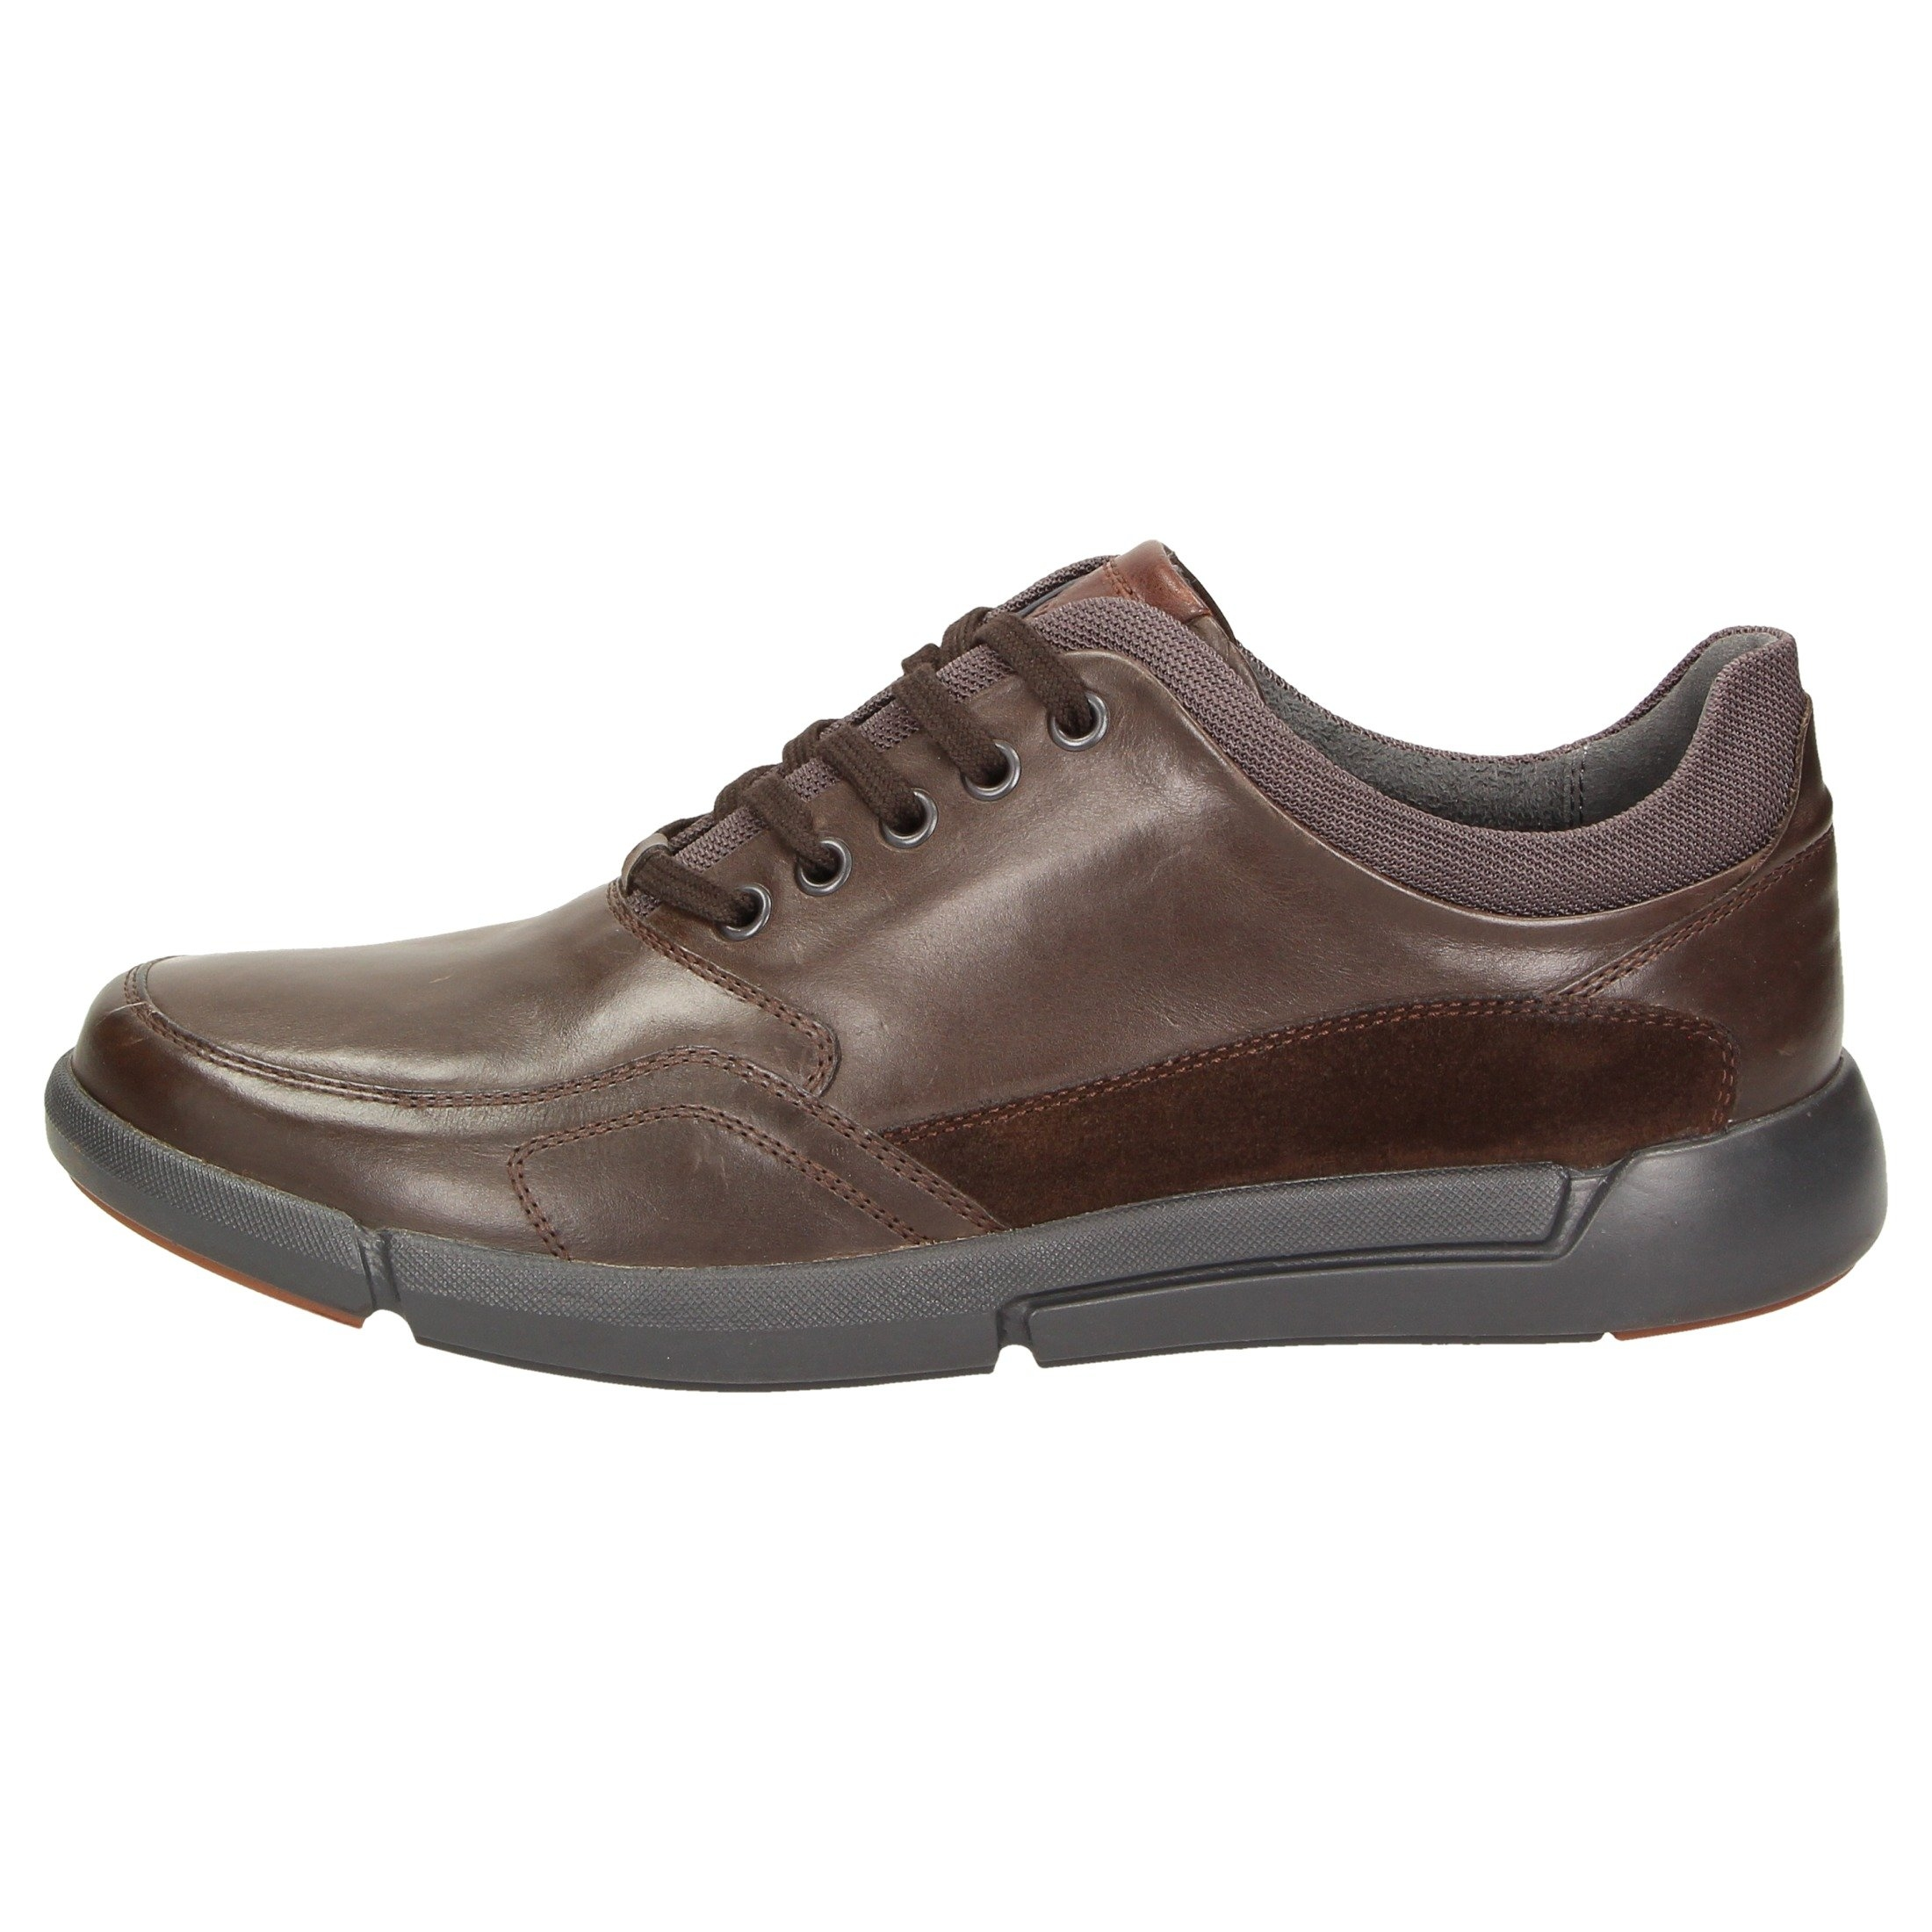 Sneakerrunario Nu 700 Sioux Kopen Online 5RjqL4A3